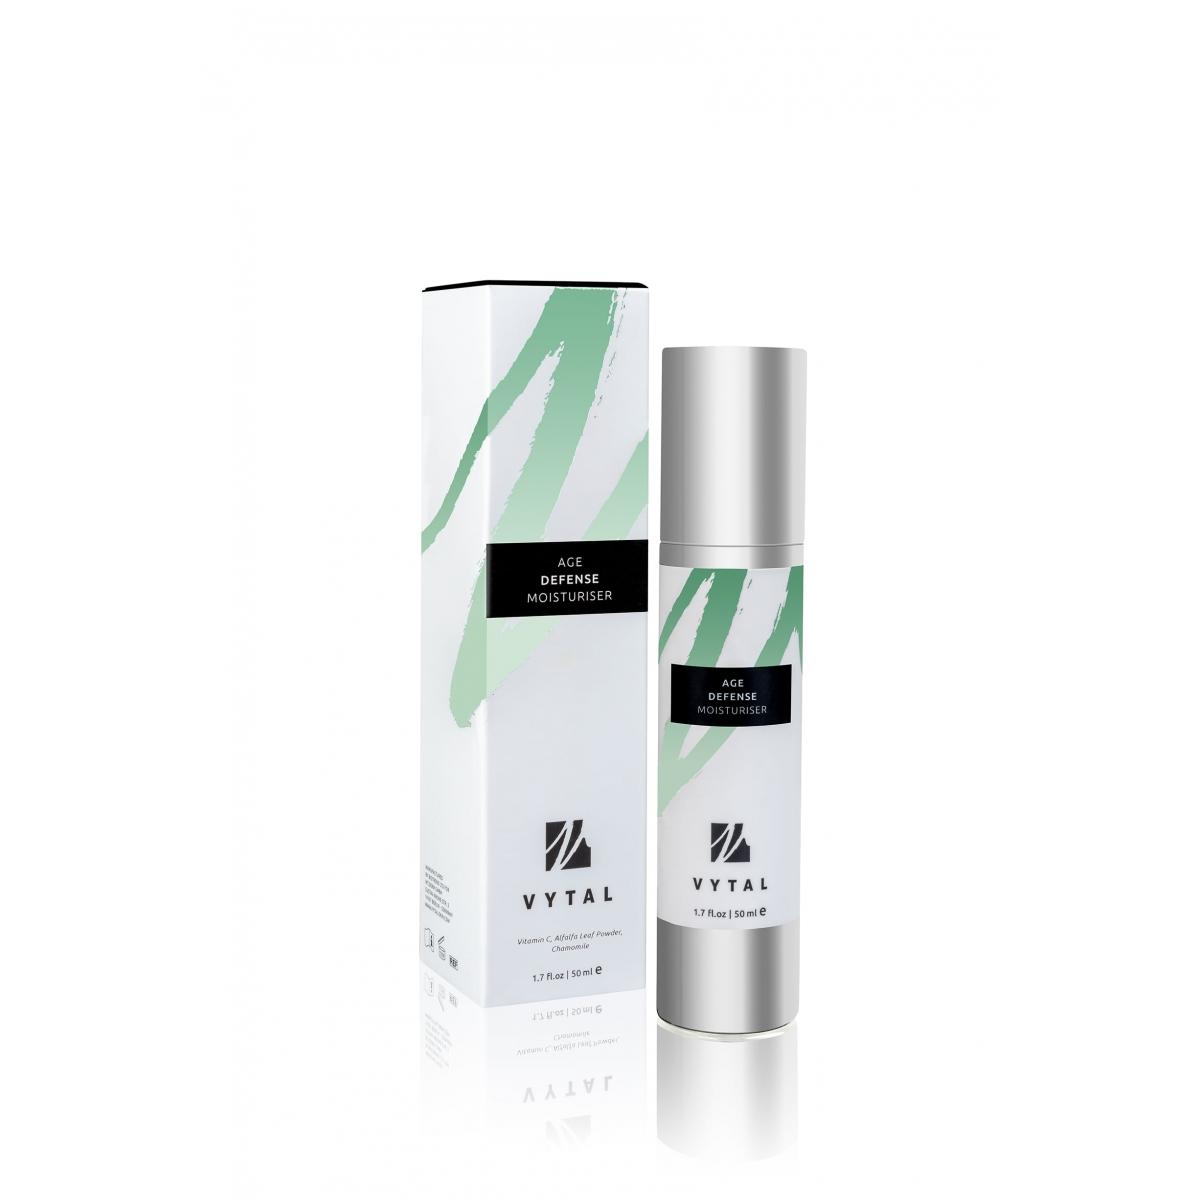 Vytal Skin - Vytal Skin - AGE DEFENCE MOISTURISER (50 ml)